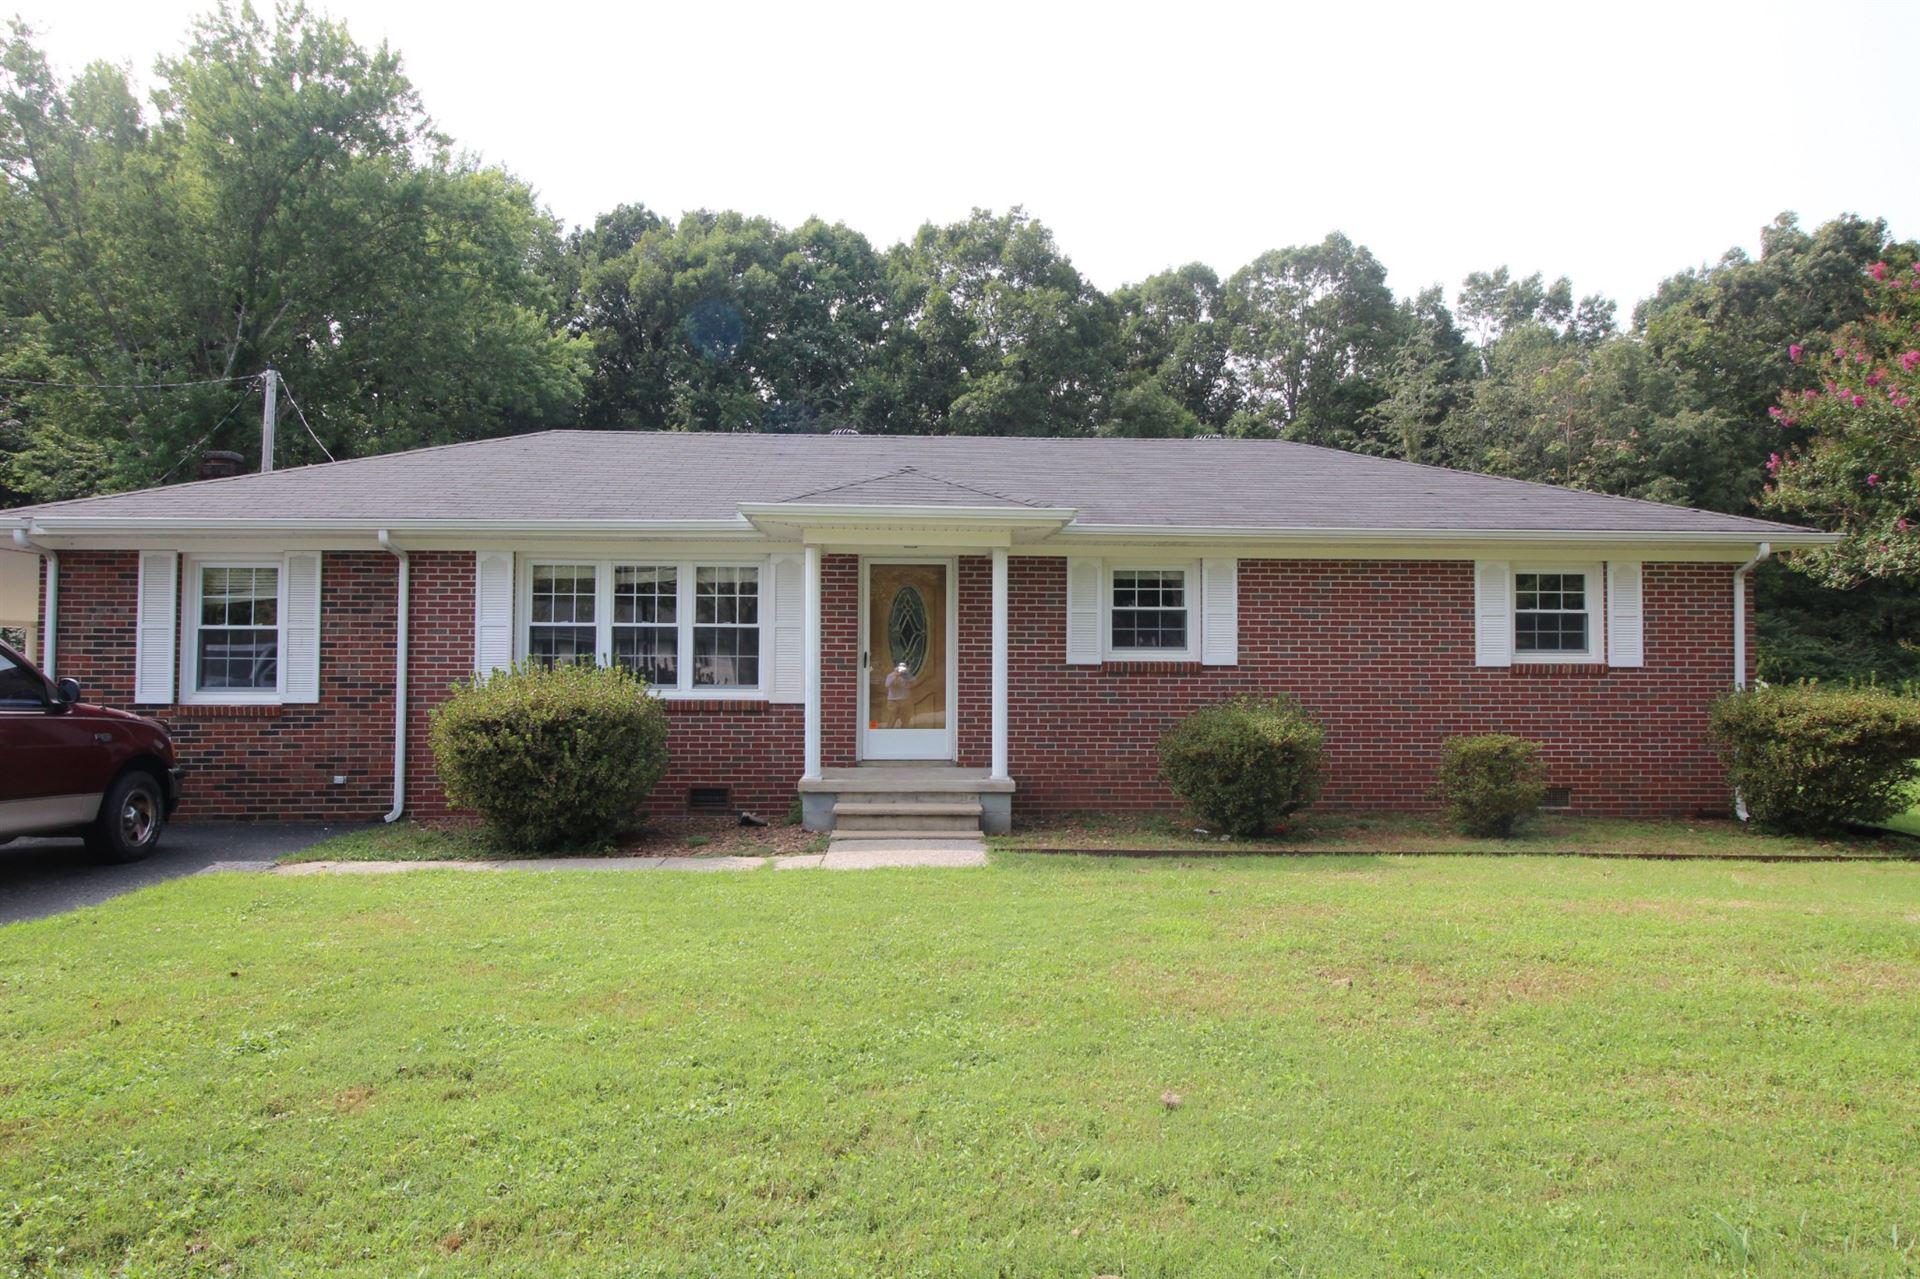 519 Crestwood Dr, Lafayette, TN 37083 - MLS#: 2189583